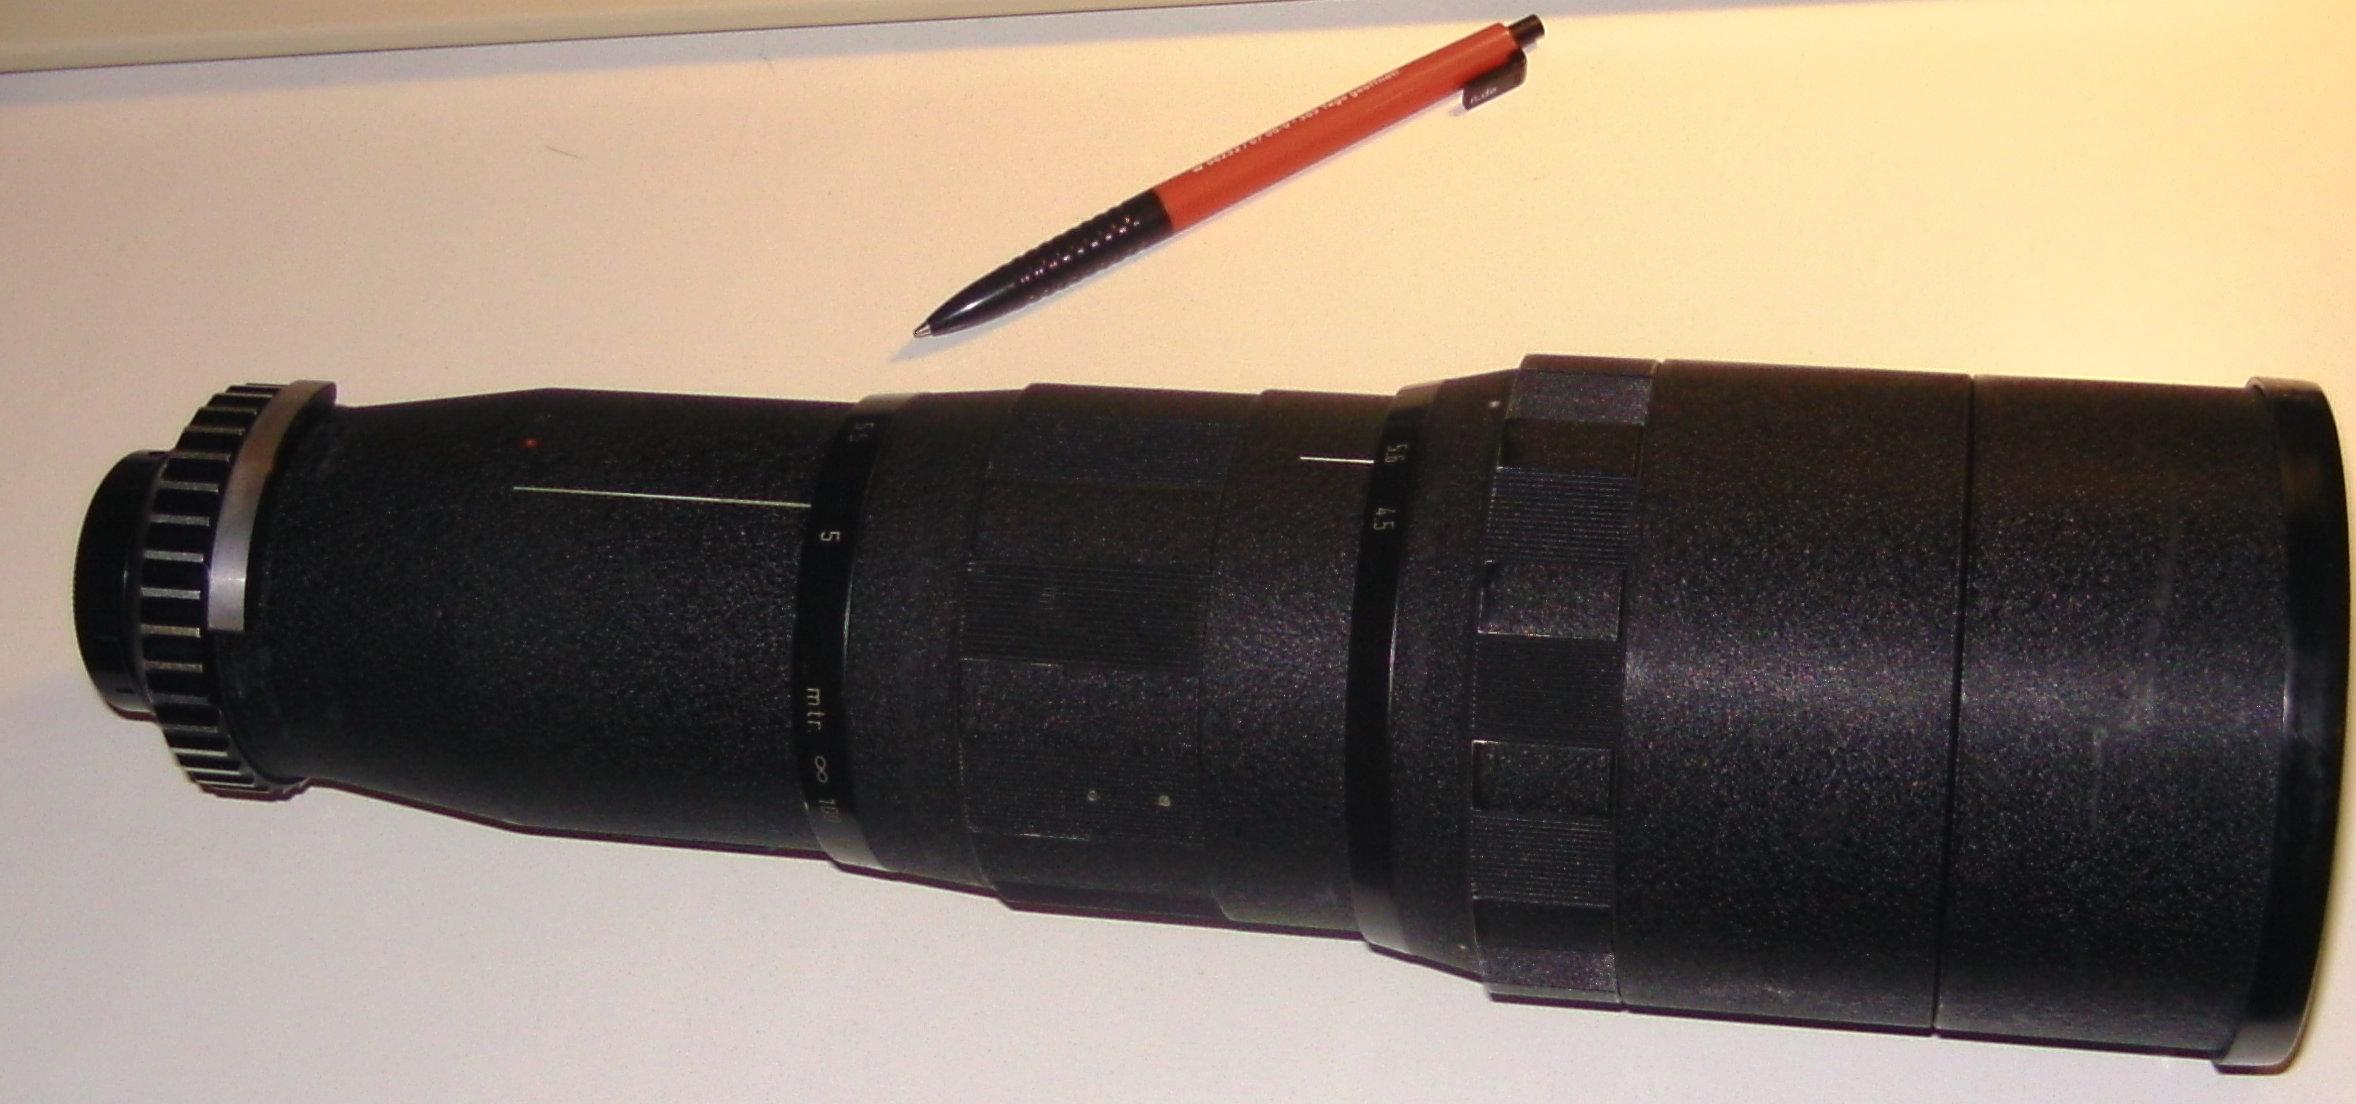 Enna Tele-Ennalyt 4,5/400mm | Analoge Fotokameras, Objektive ...